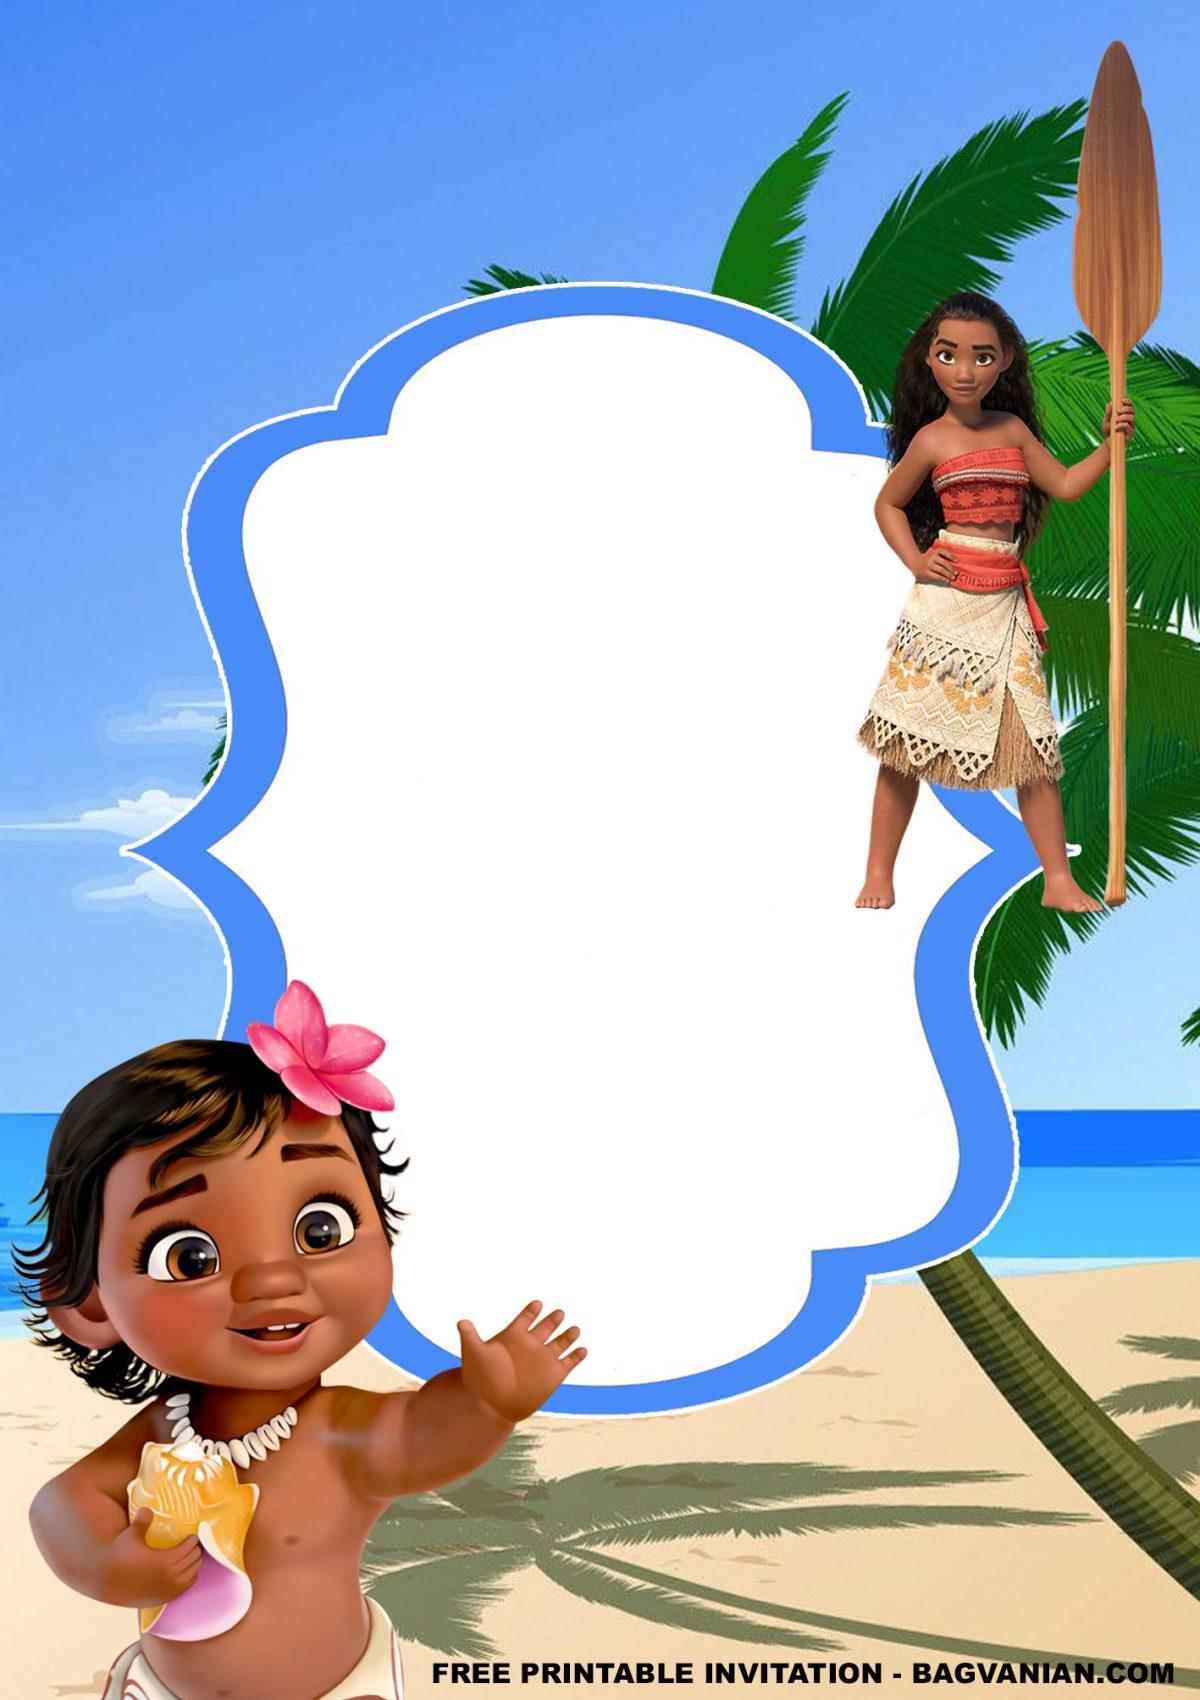 Free Printable Baby Moana Birthday Invitation Templates With Beautiful Coastline Background